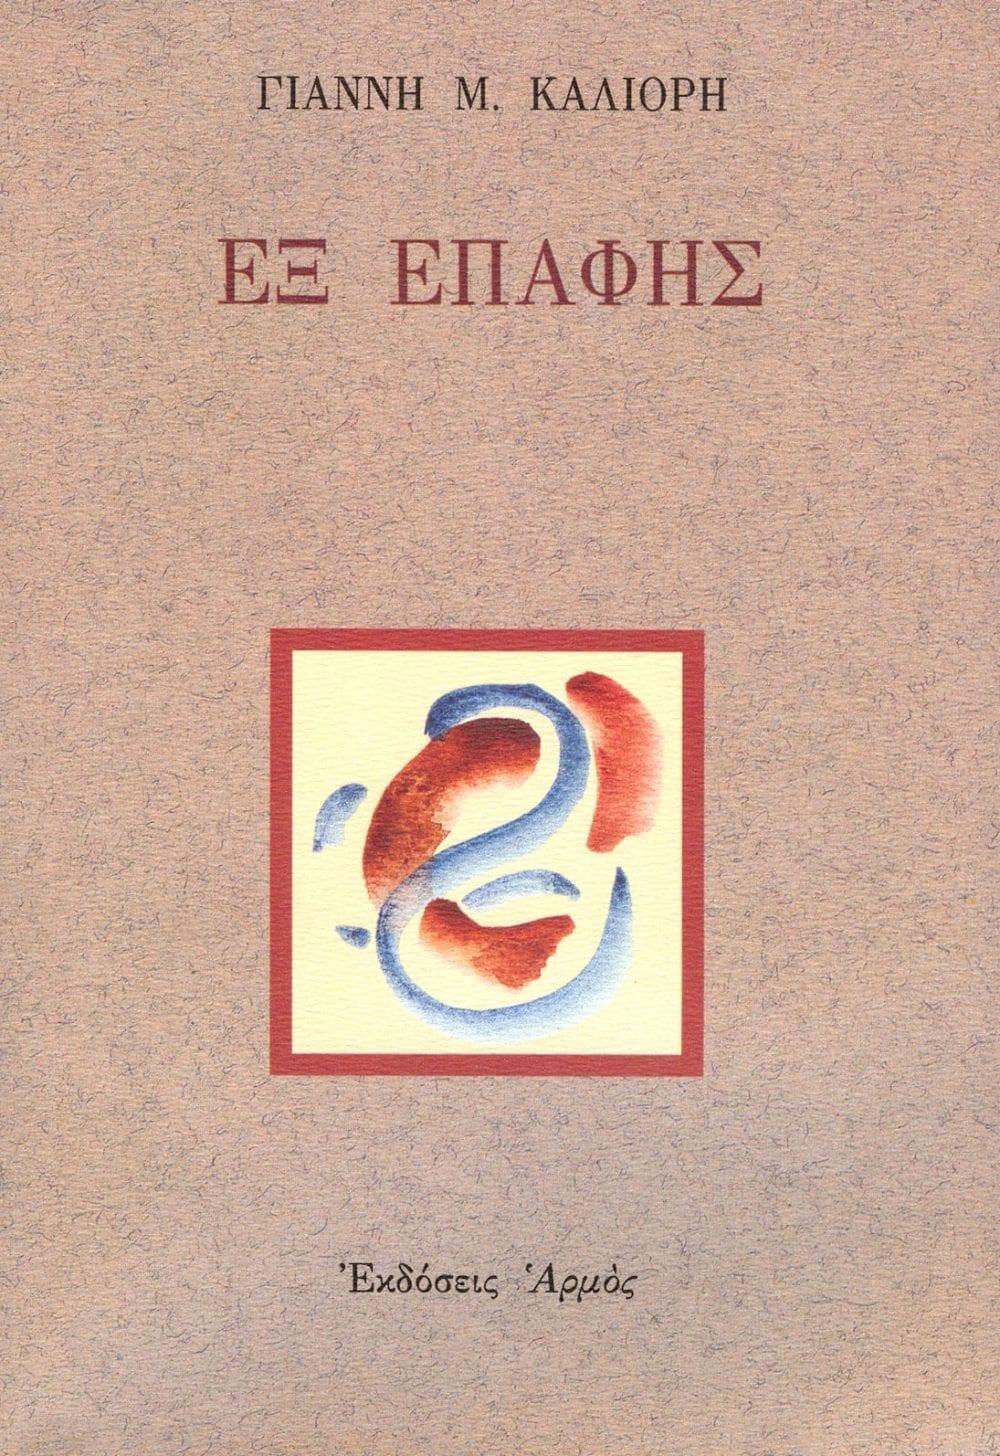 eks-epafis kalioris